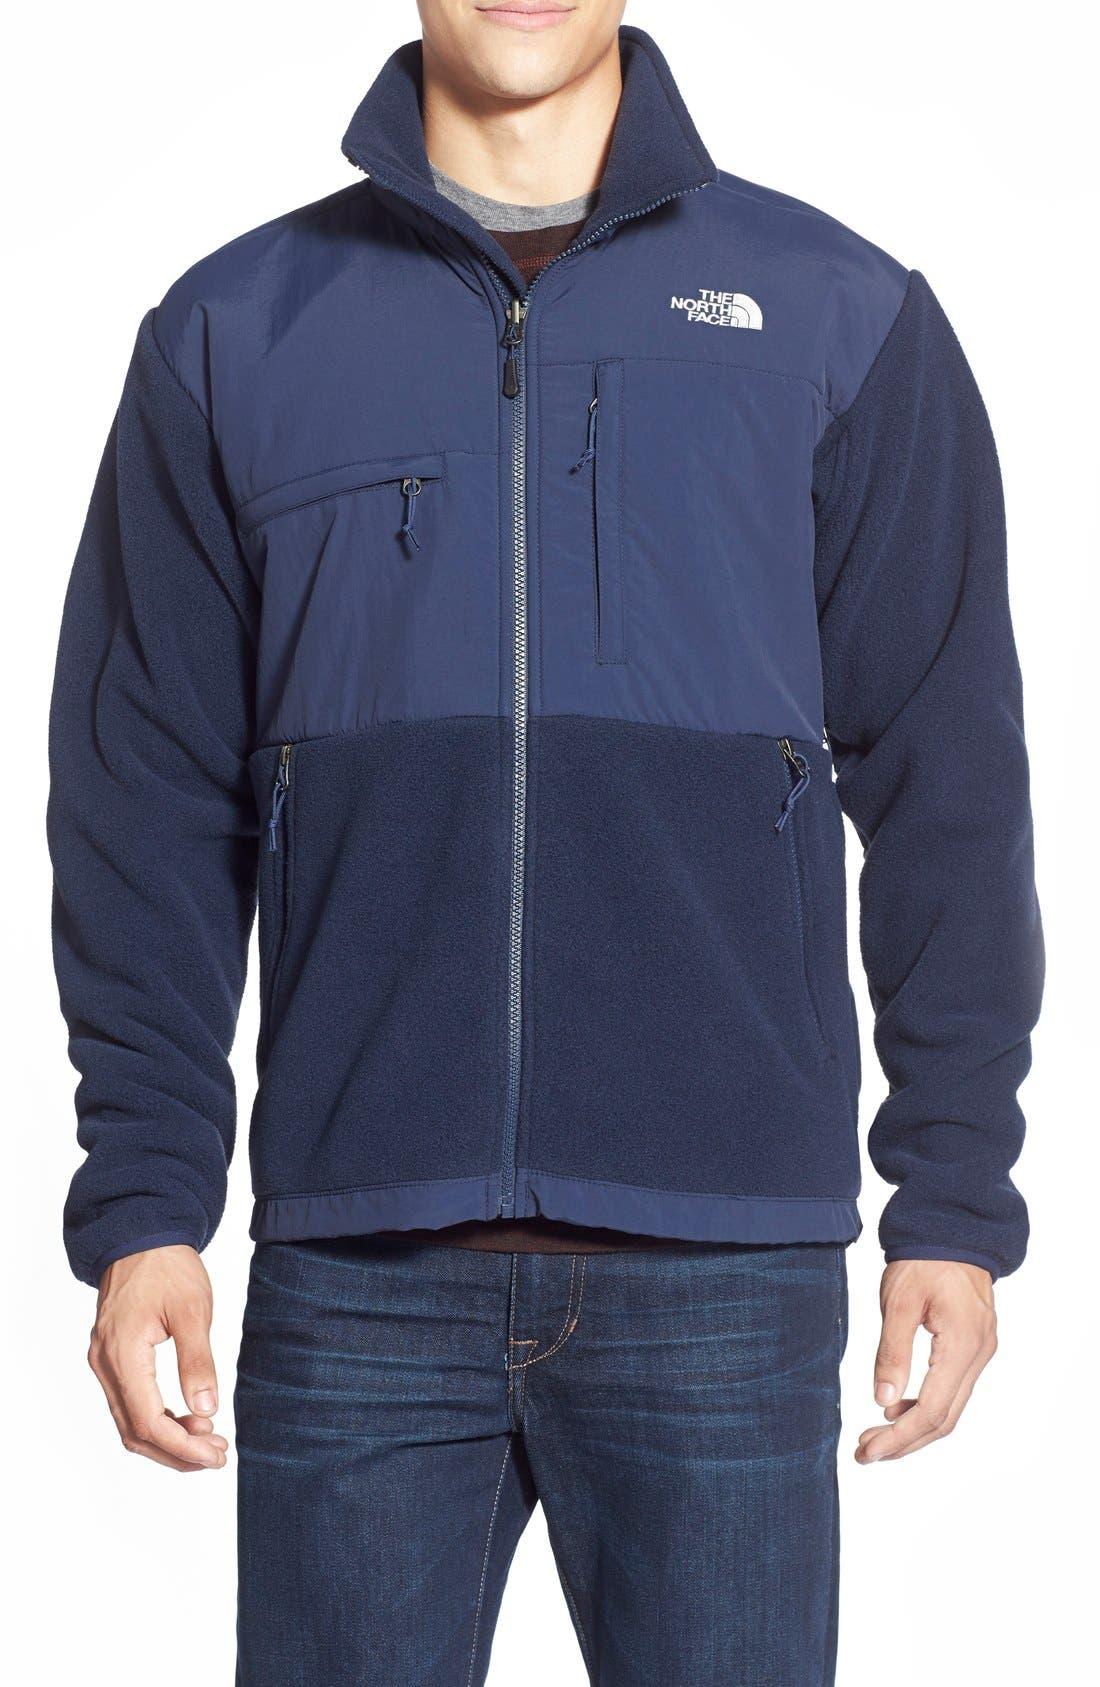 Main Image - The North Face 'Denali' Recycled Polartec 300® Fleece Jacket